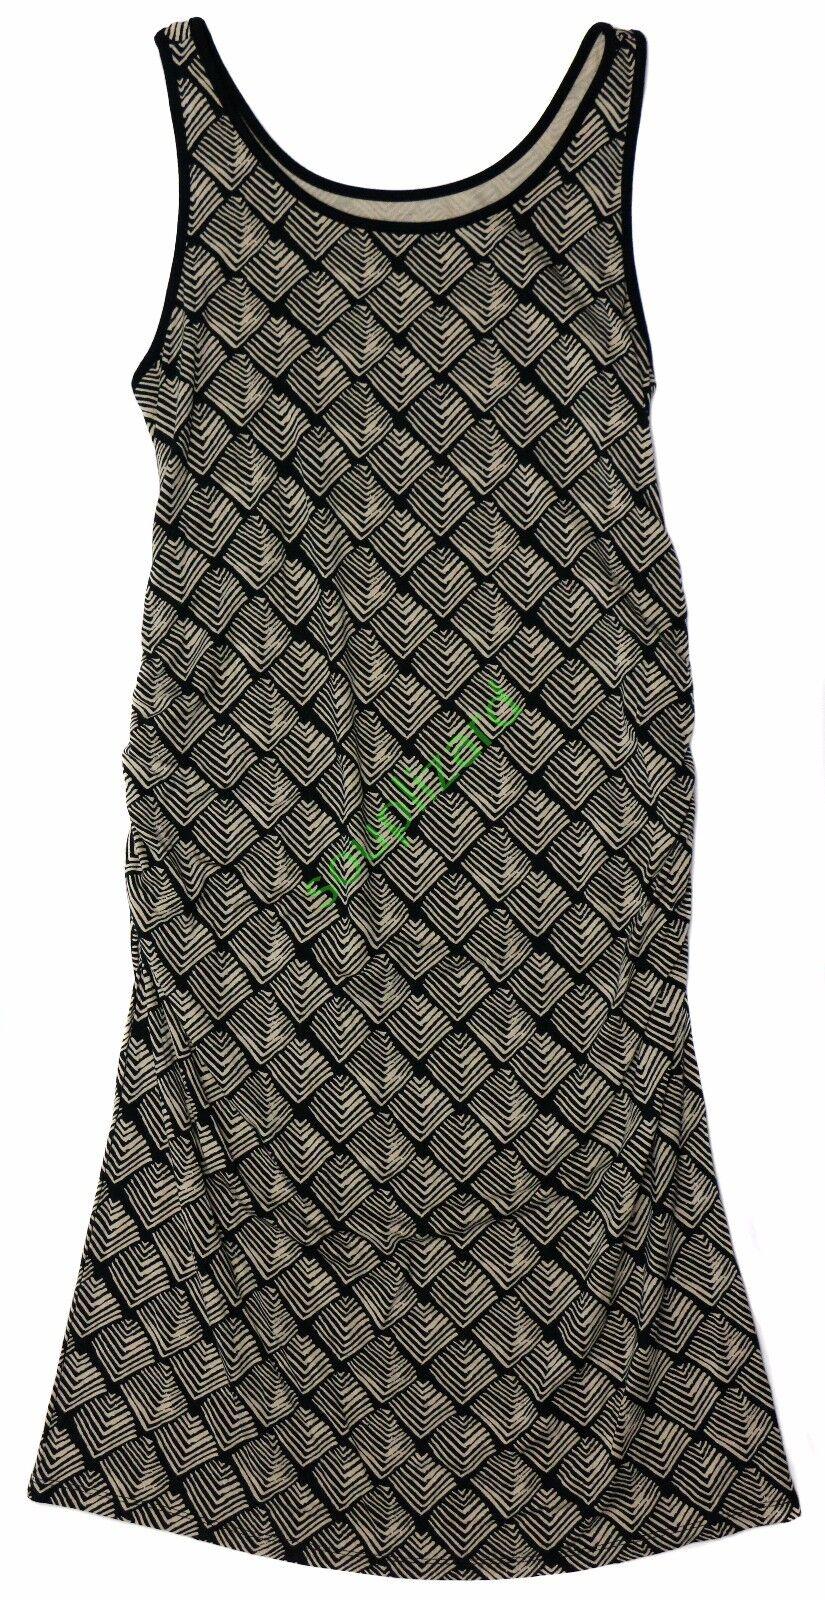 Liz lange maternity dress sleeveless black tan diamond print picture 1 of 6 ombrellifo Gallery